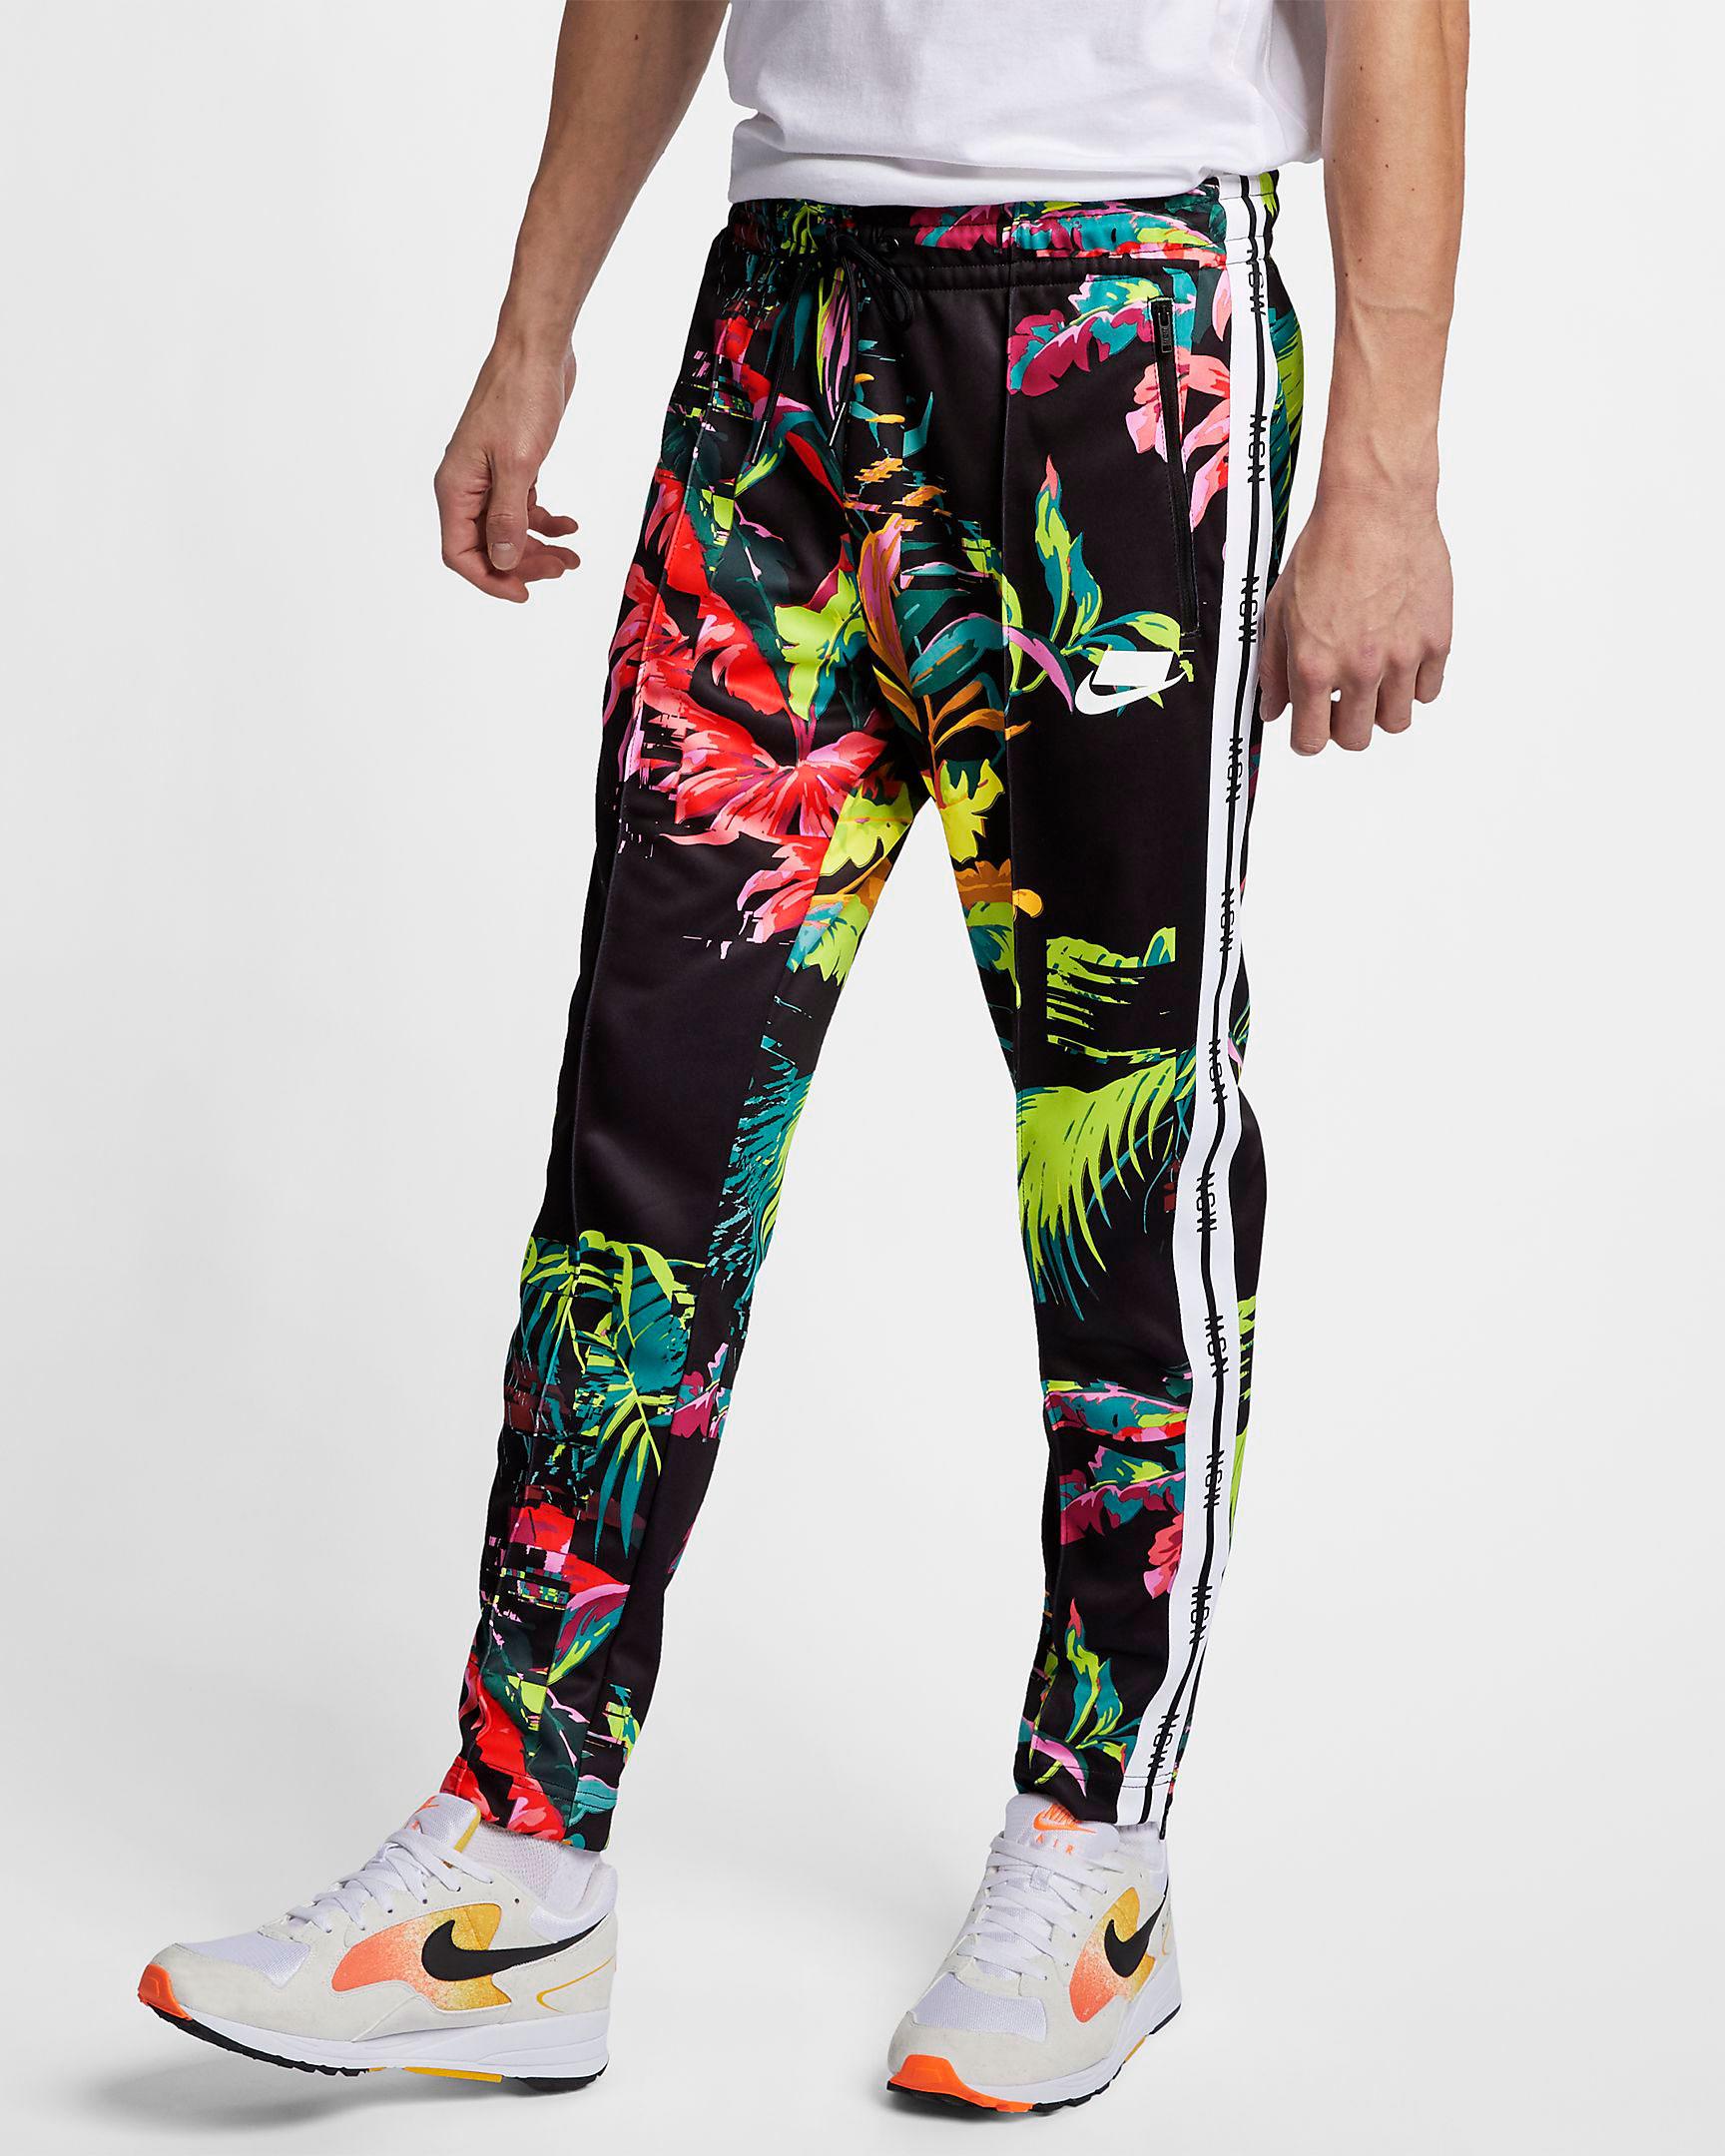 nike-tropicano-floral-track-pants-1